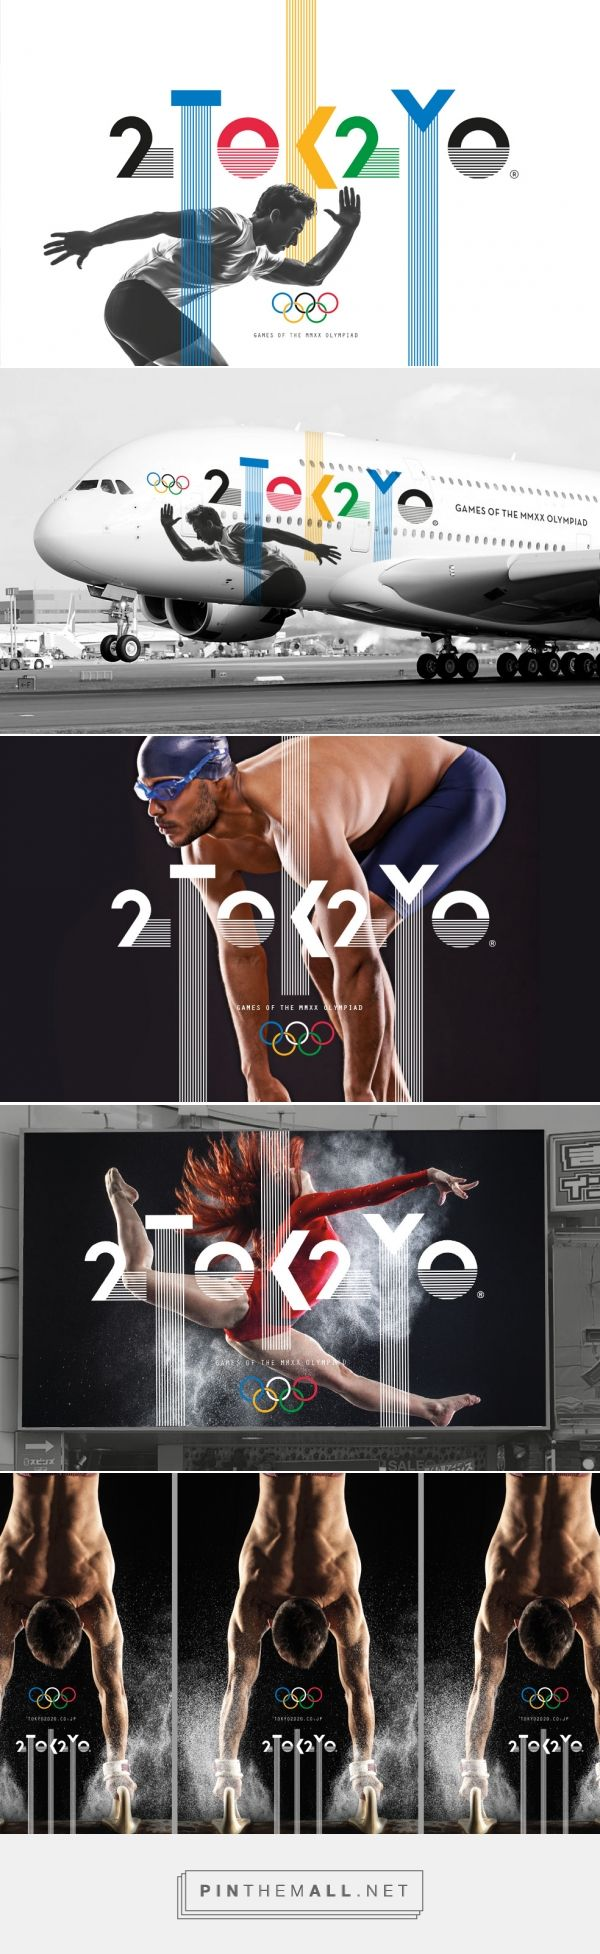 Tokyo 2020 Olympics #Logo #Design